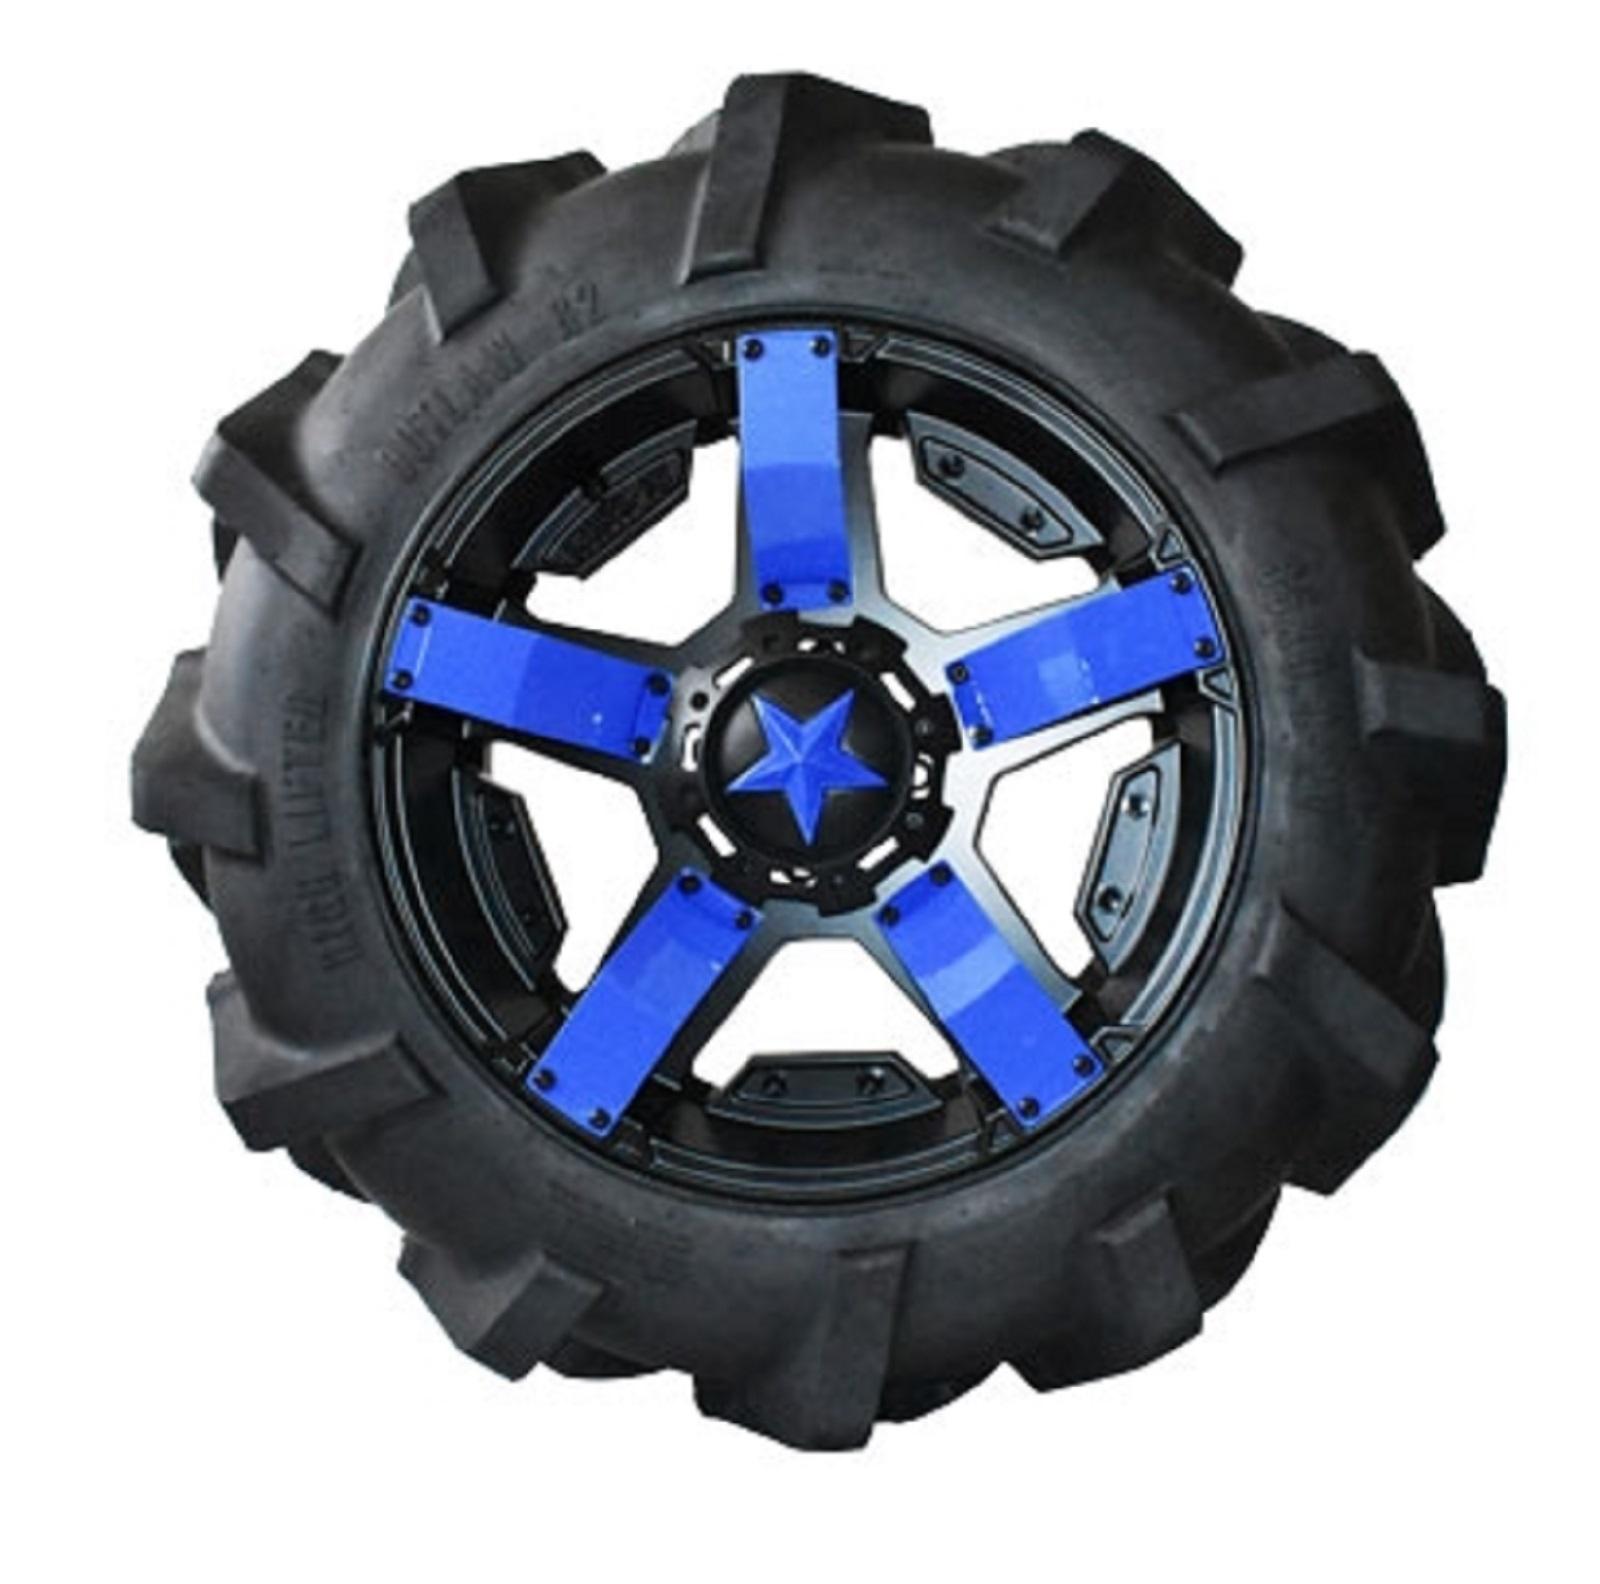 High Lifter Outlaw R2 | 35x9x20 Tire | OLR2-35920